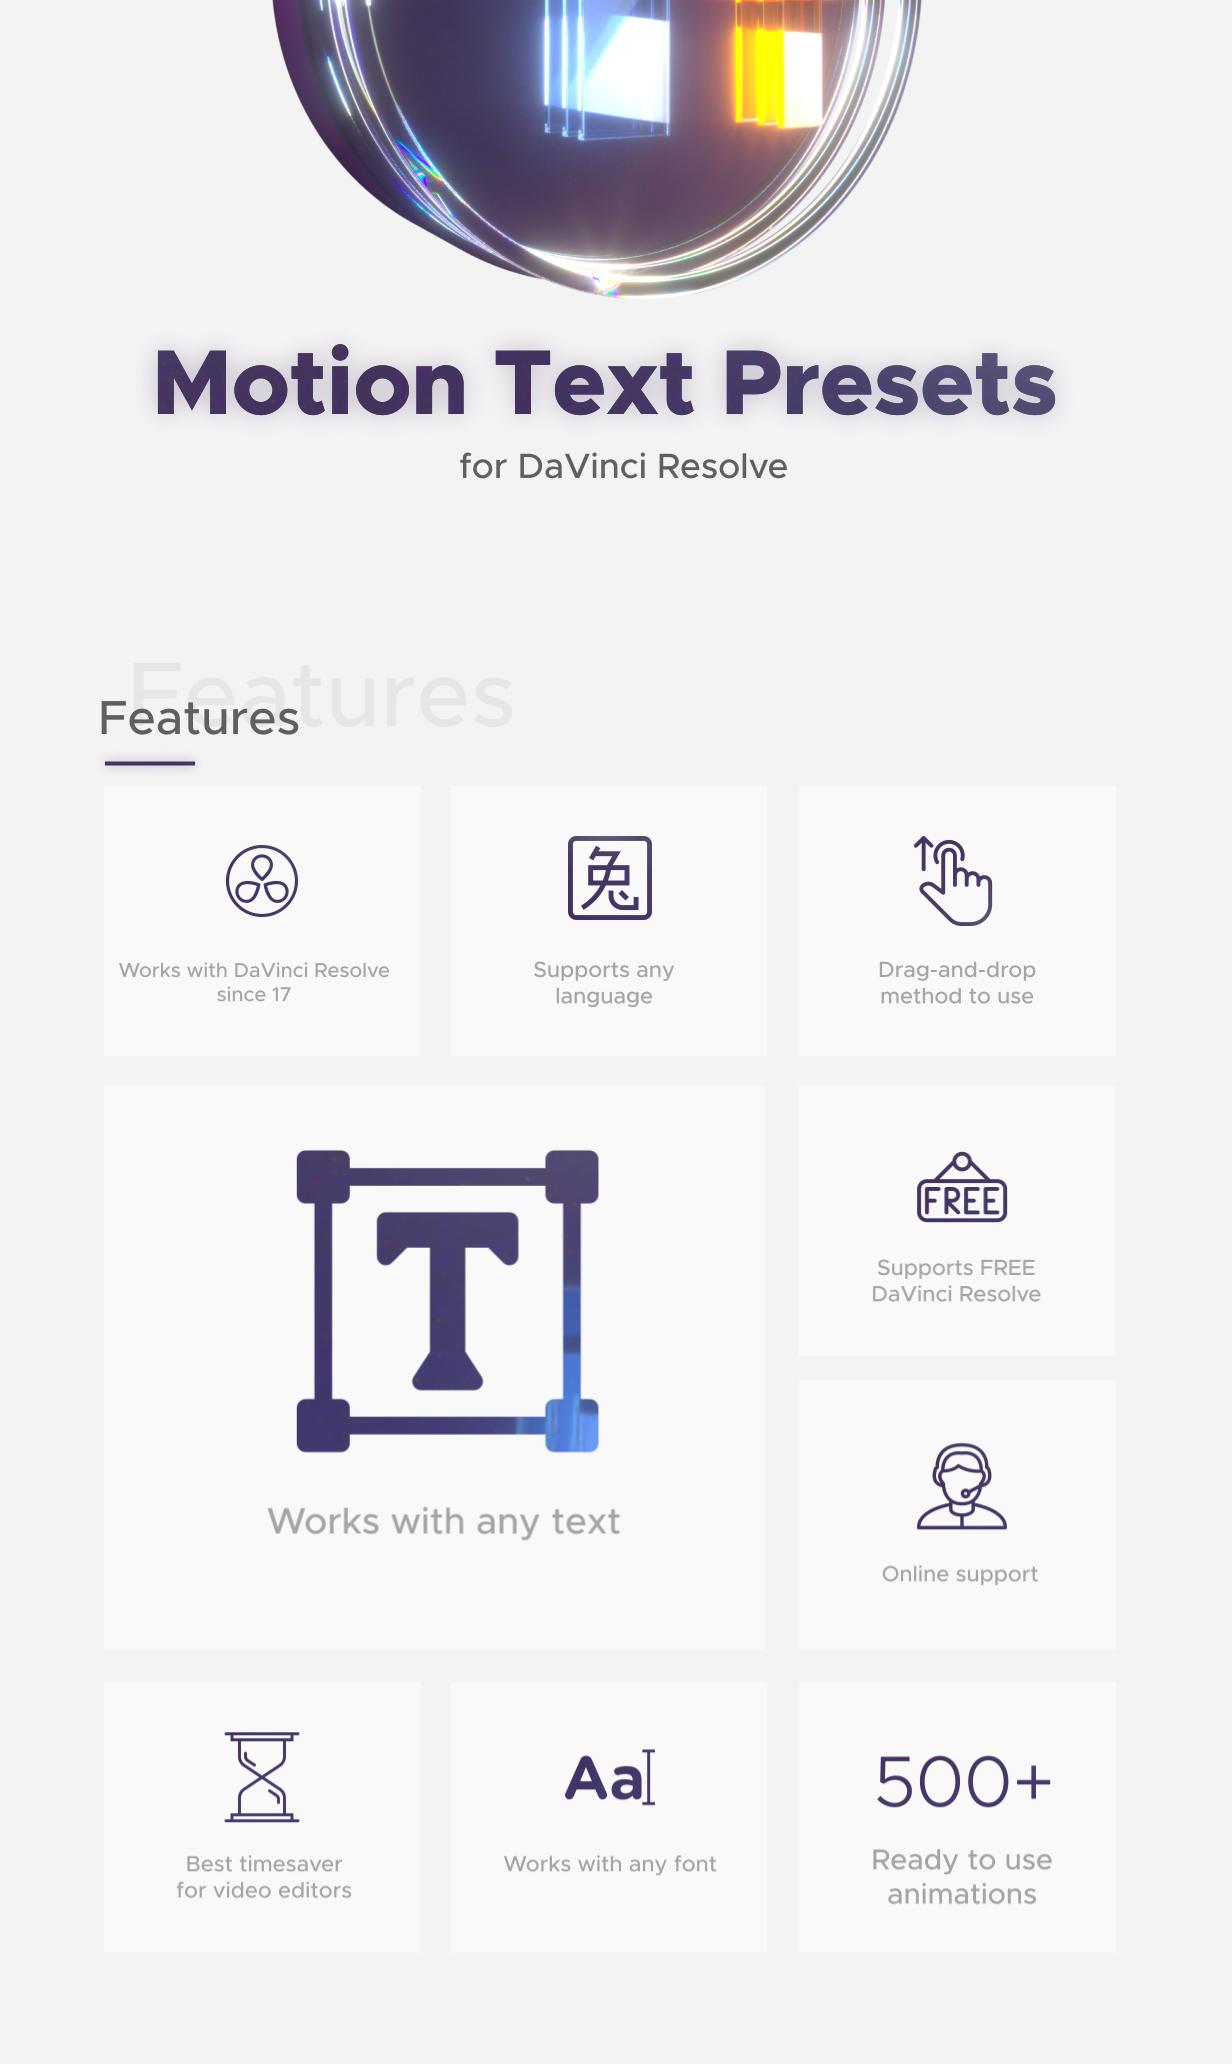 Text Presets for DaVinci Resolve - 3